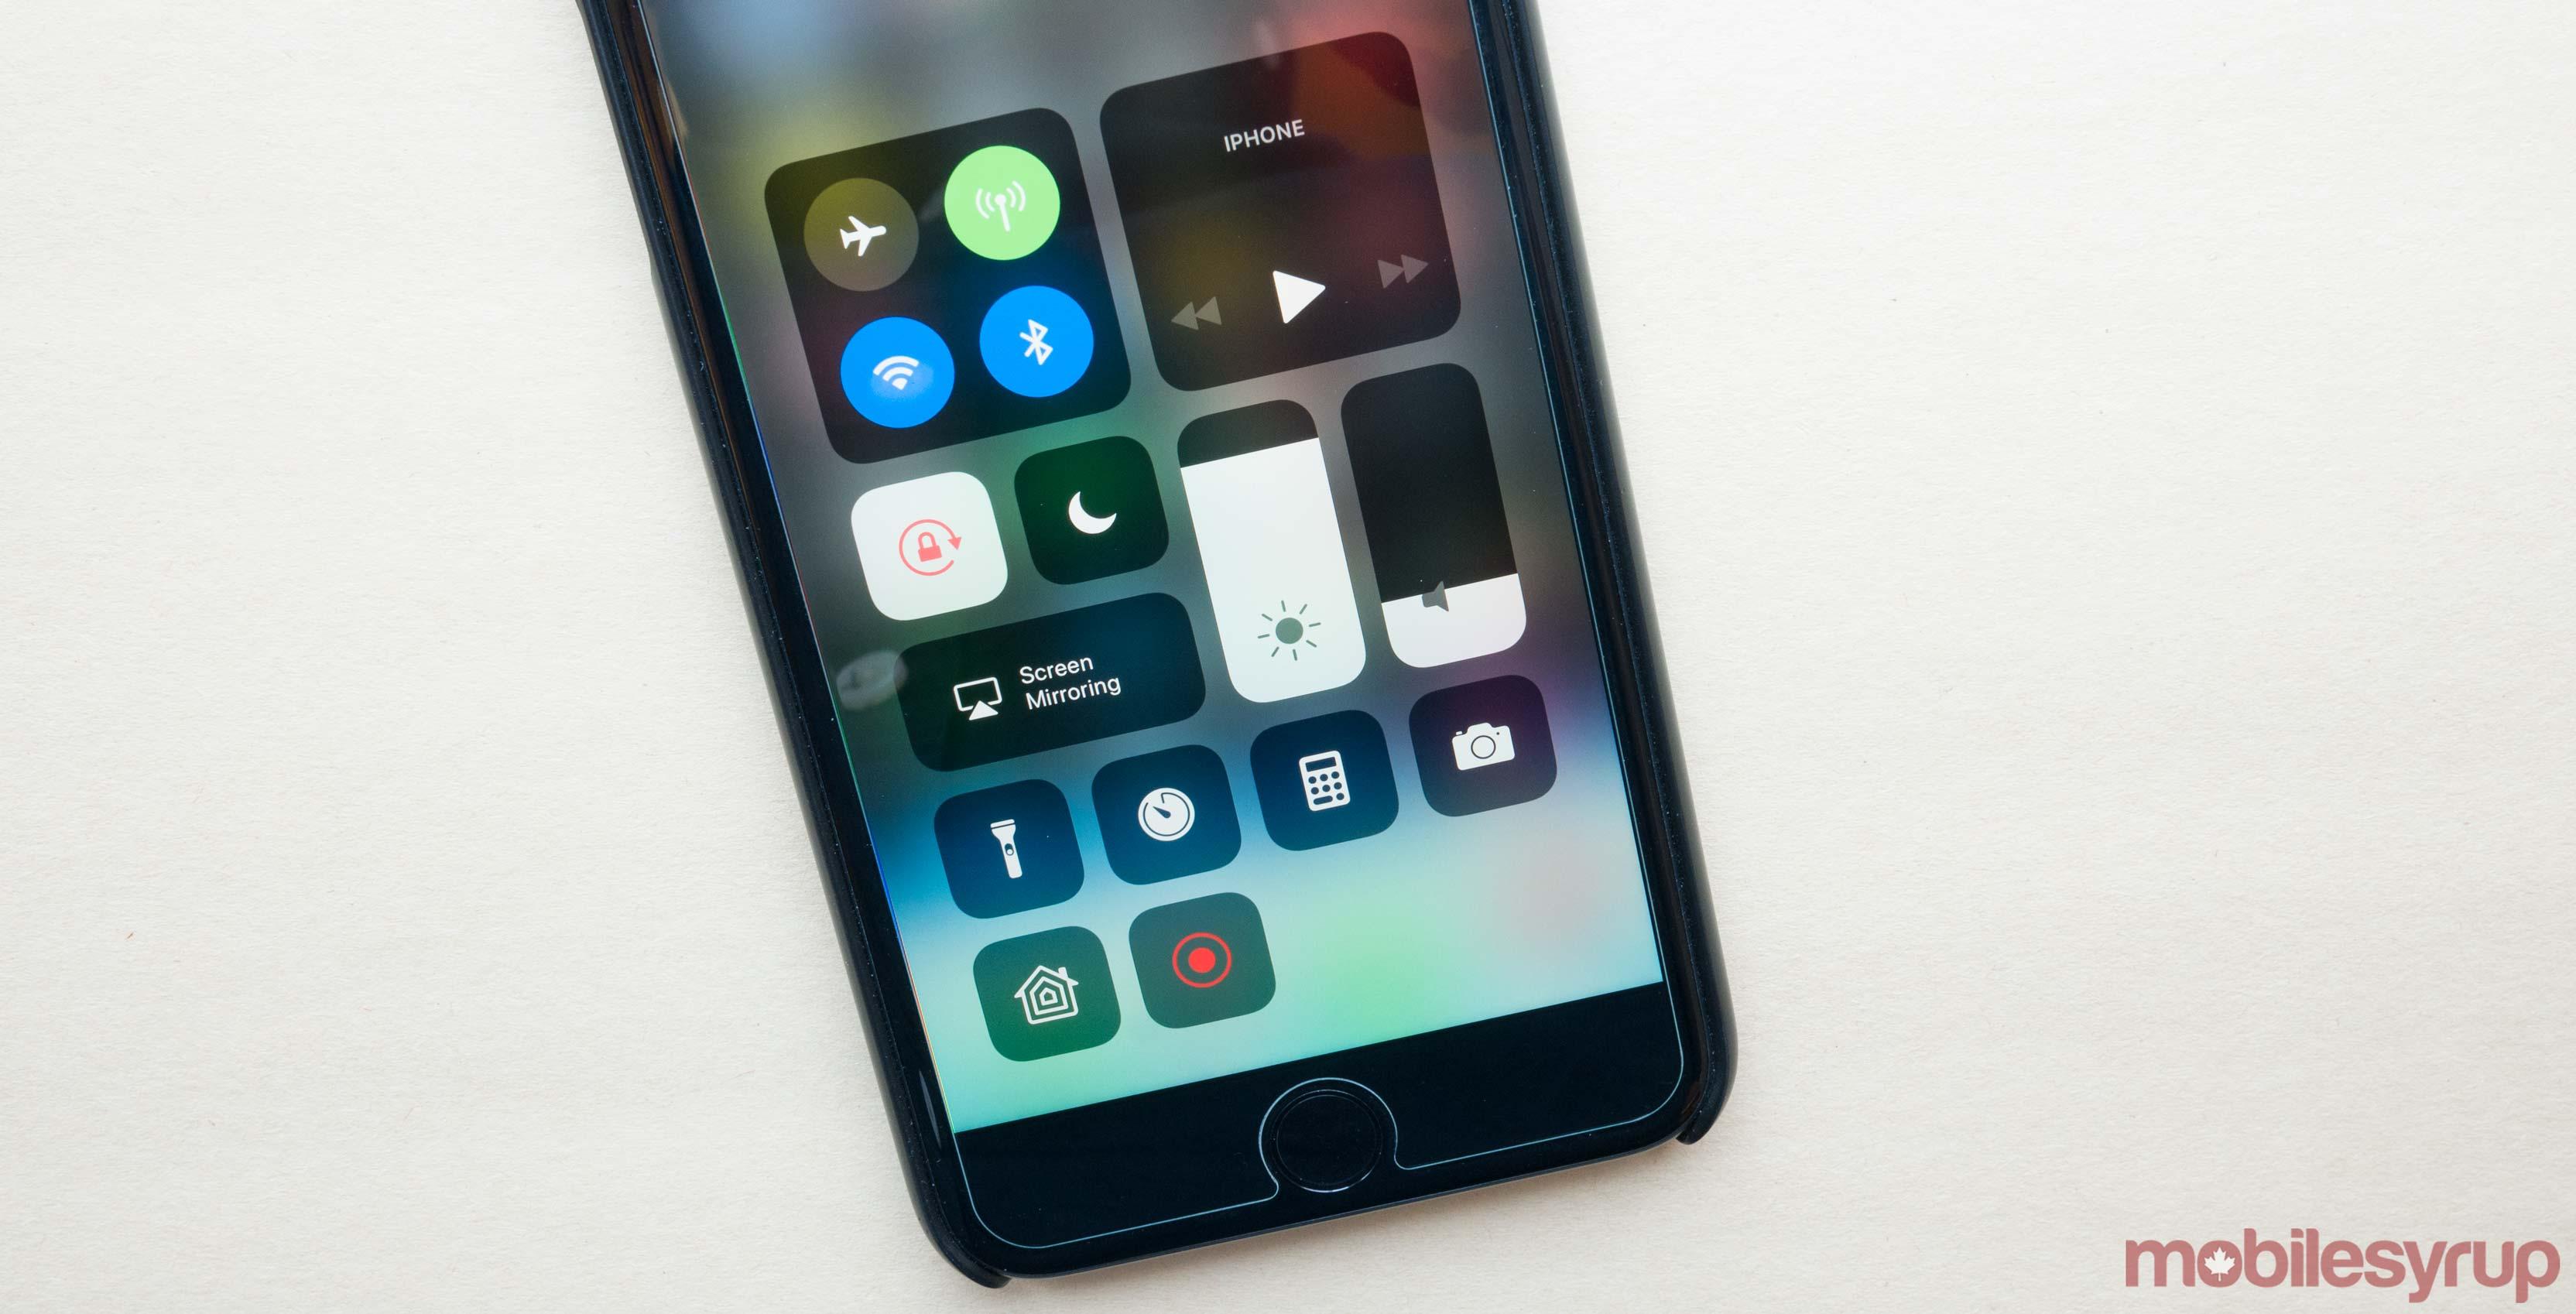 iOS 11 control centre on iPhone 7